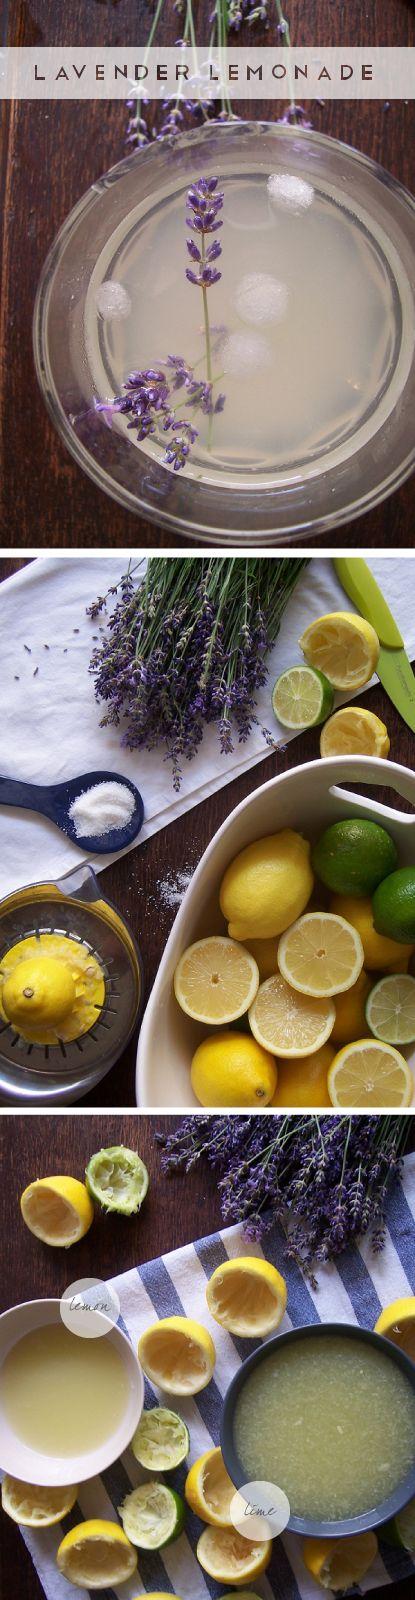 Lavender LemonadeInfused Lemonade, Homemade Lavender, Lavender Infused ...